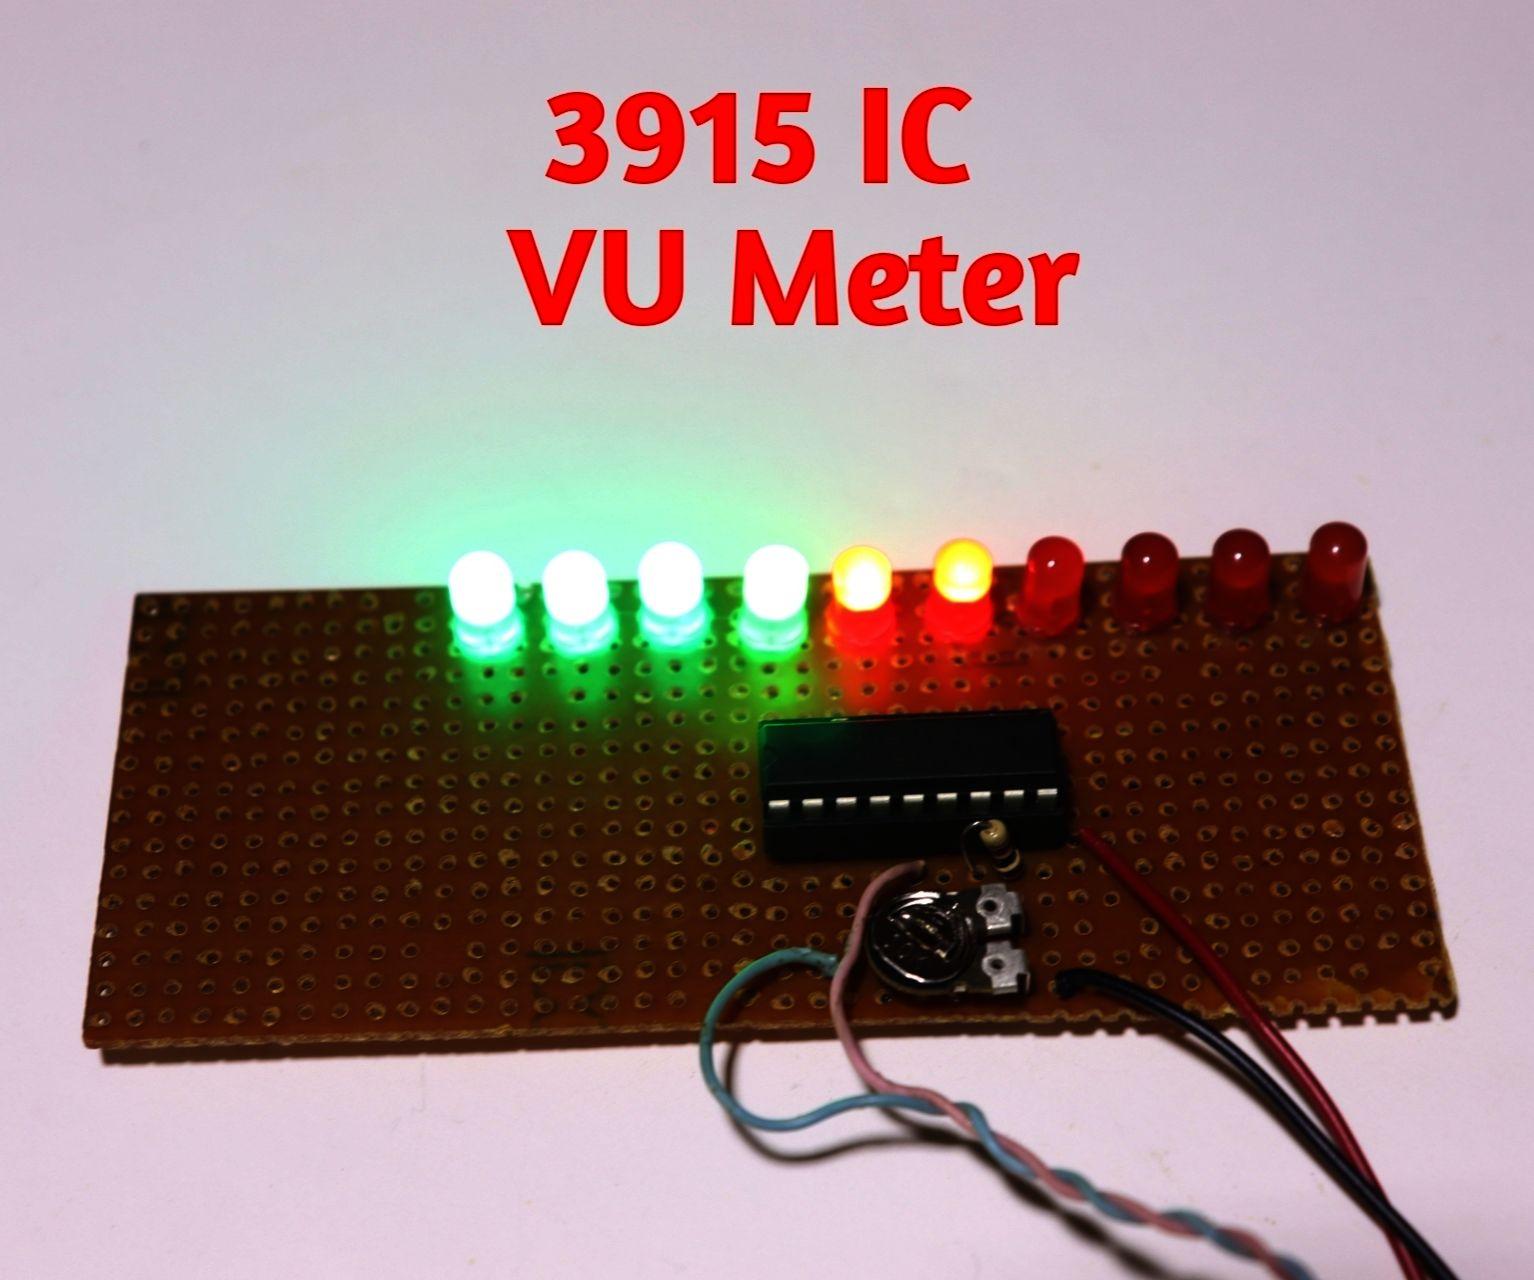 VU Meter Using 3915 IC